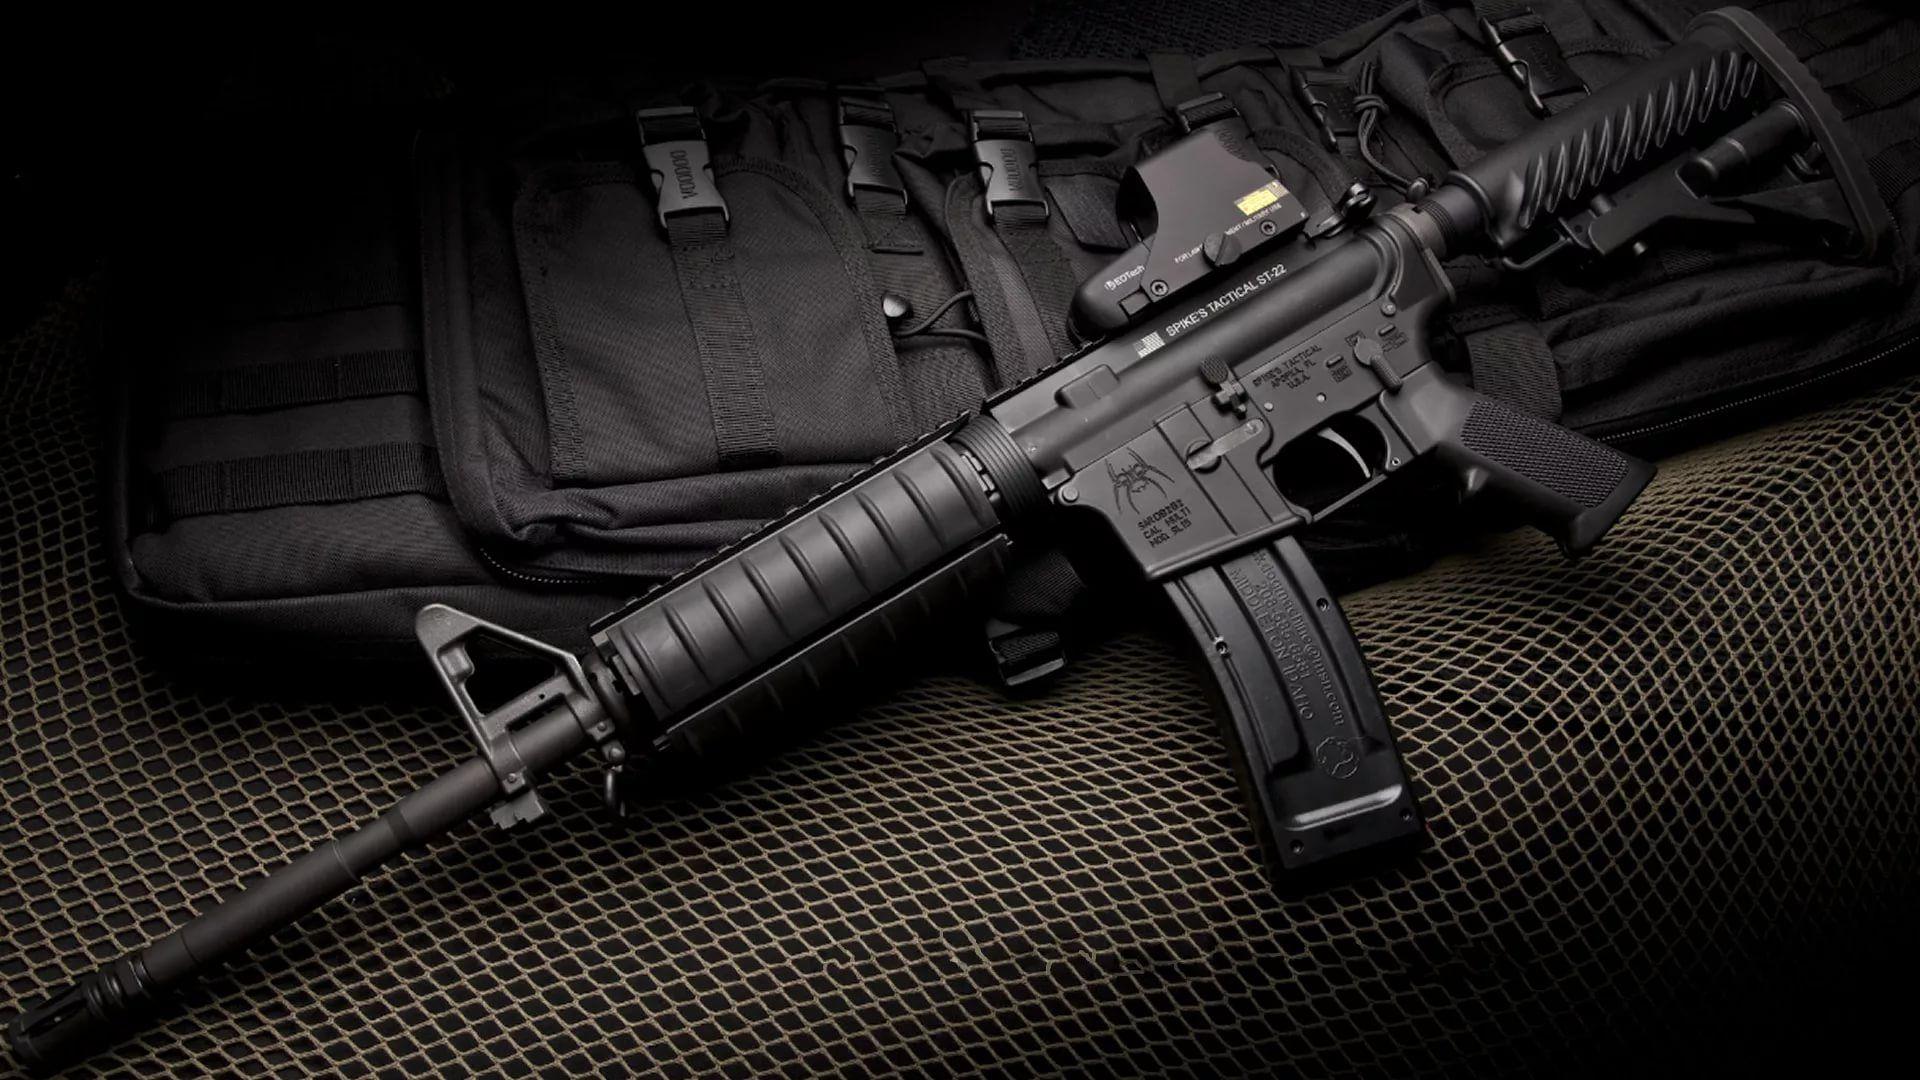 Gun For Desktop Image